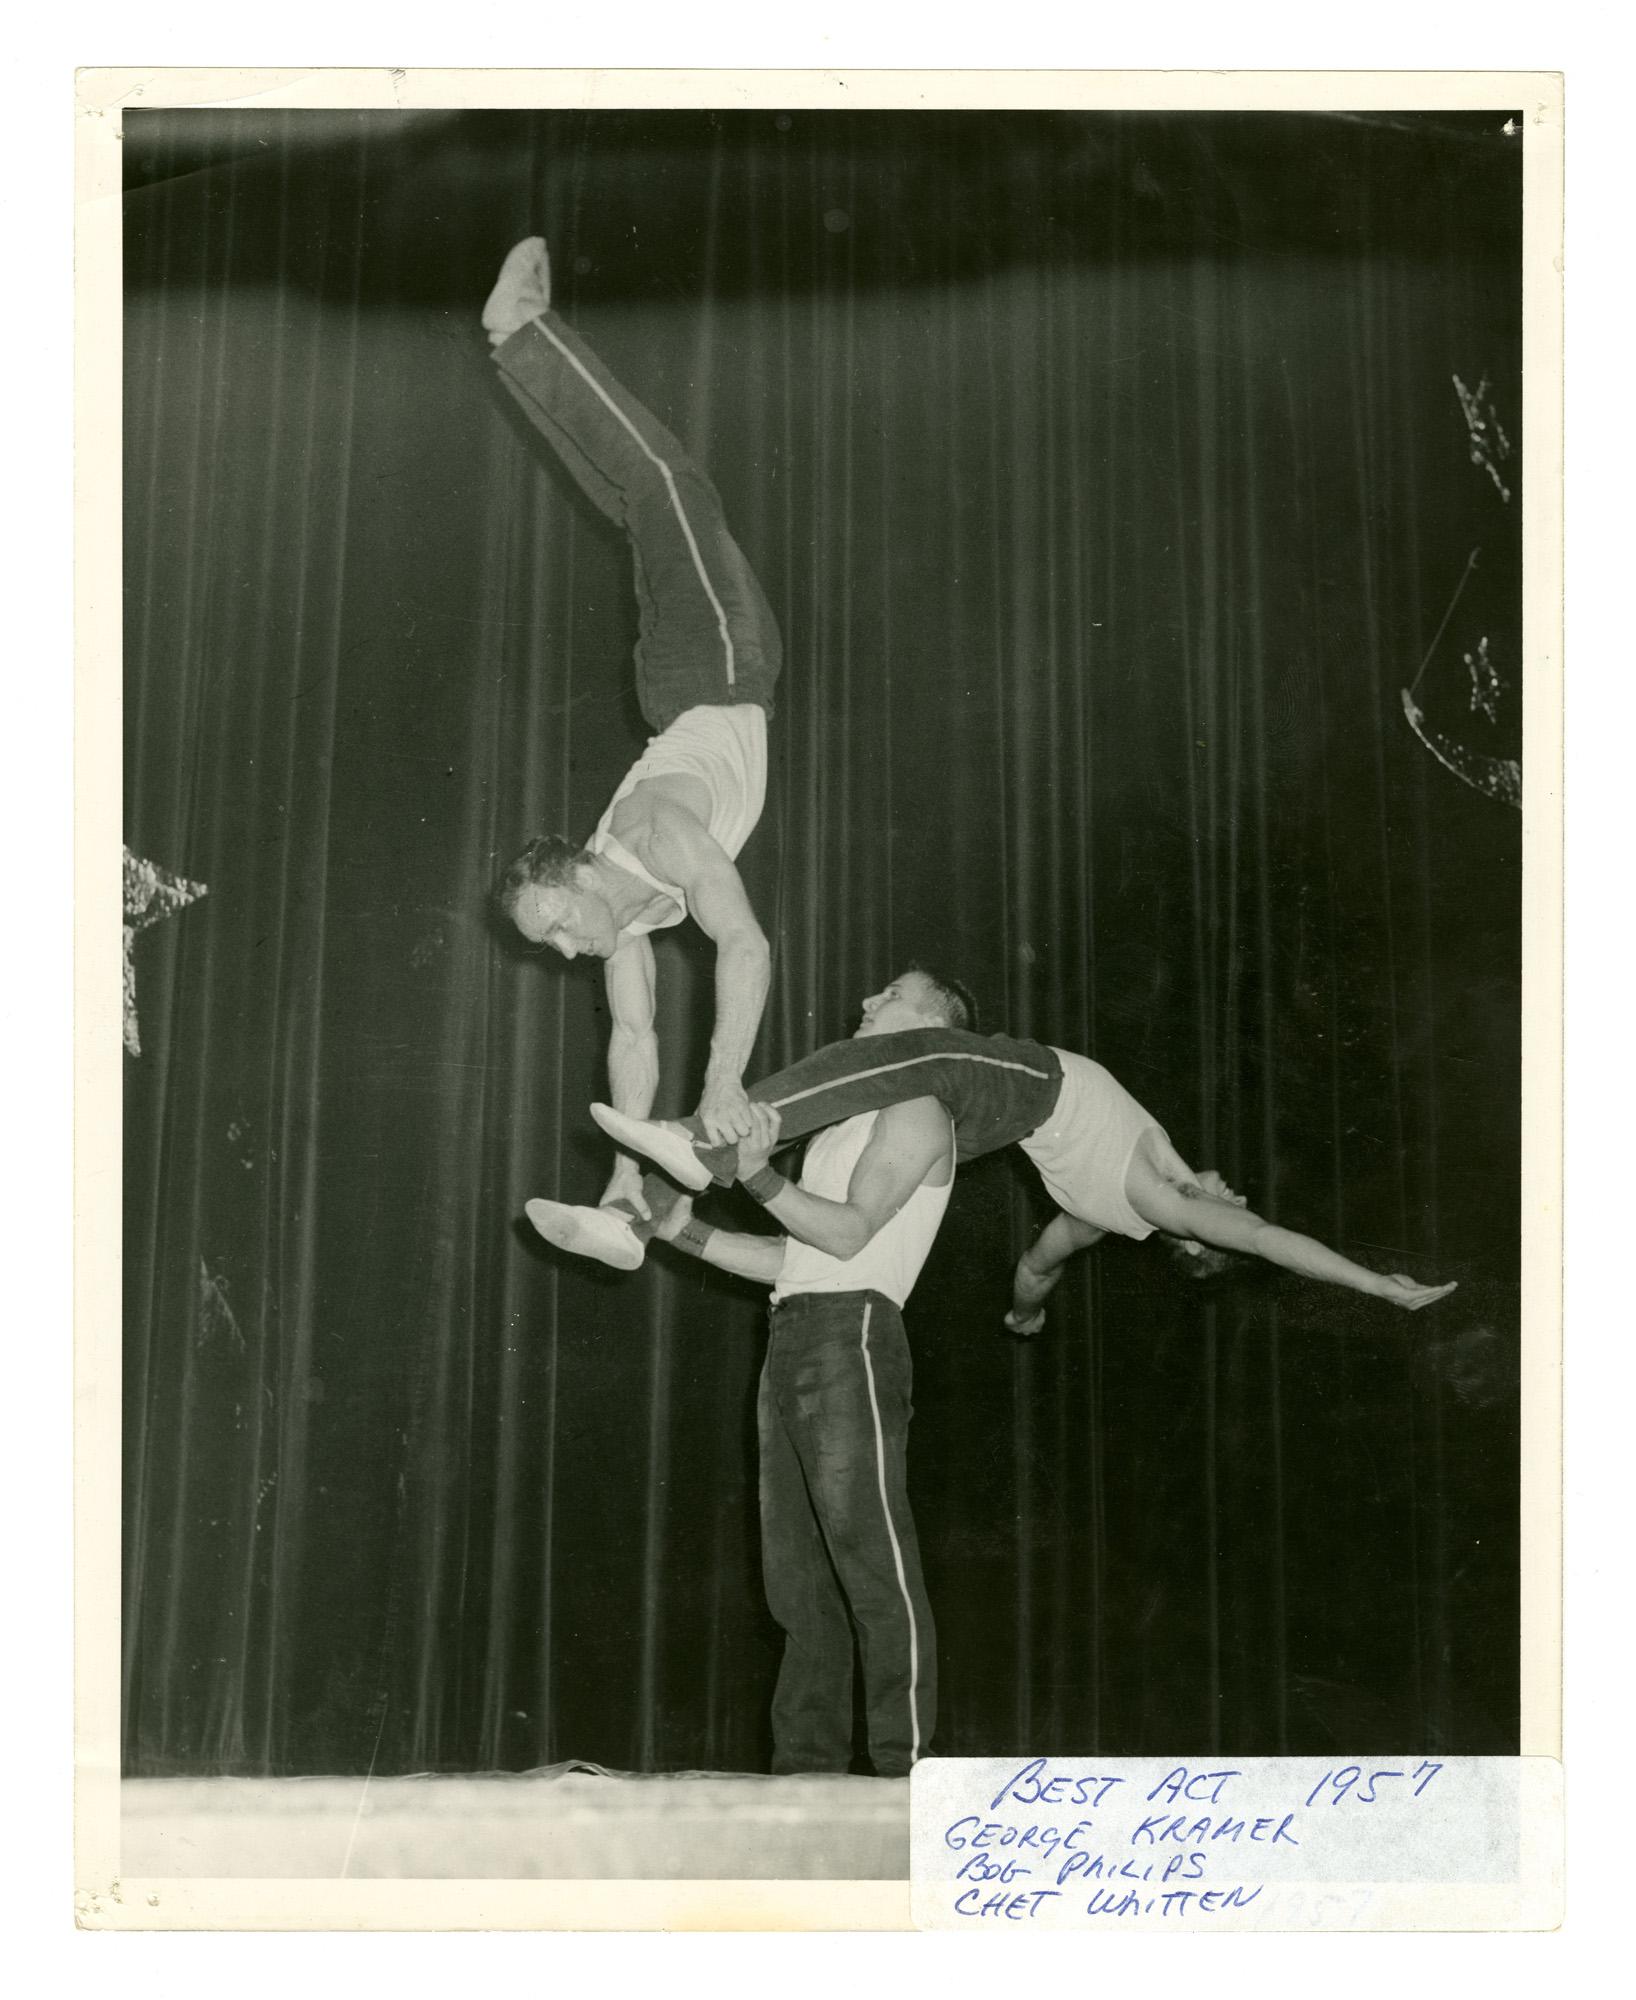 1957 - Men's Triples Balancing